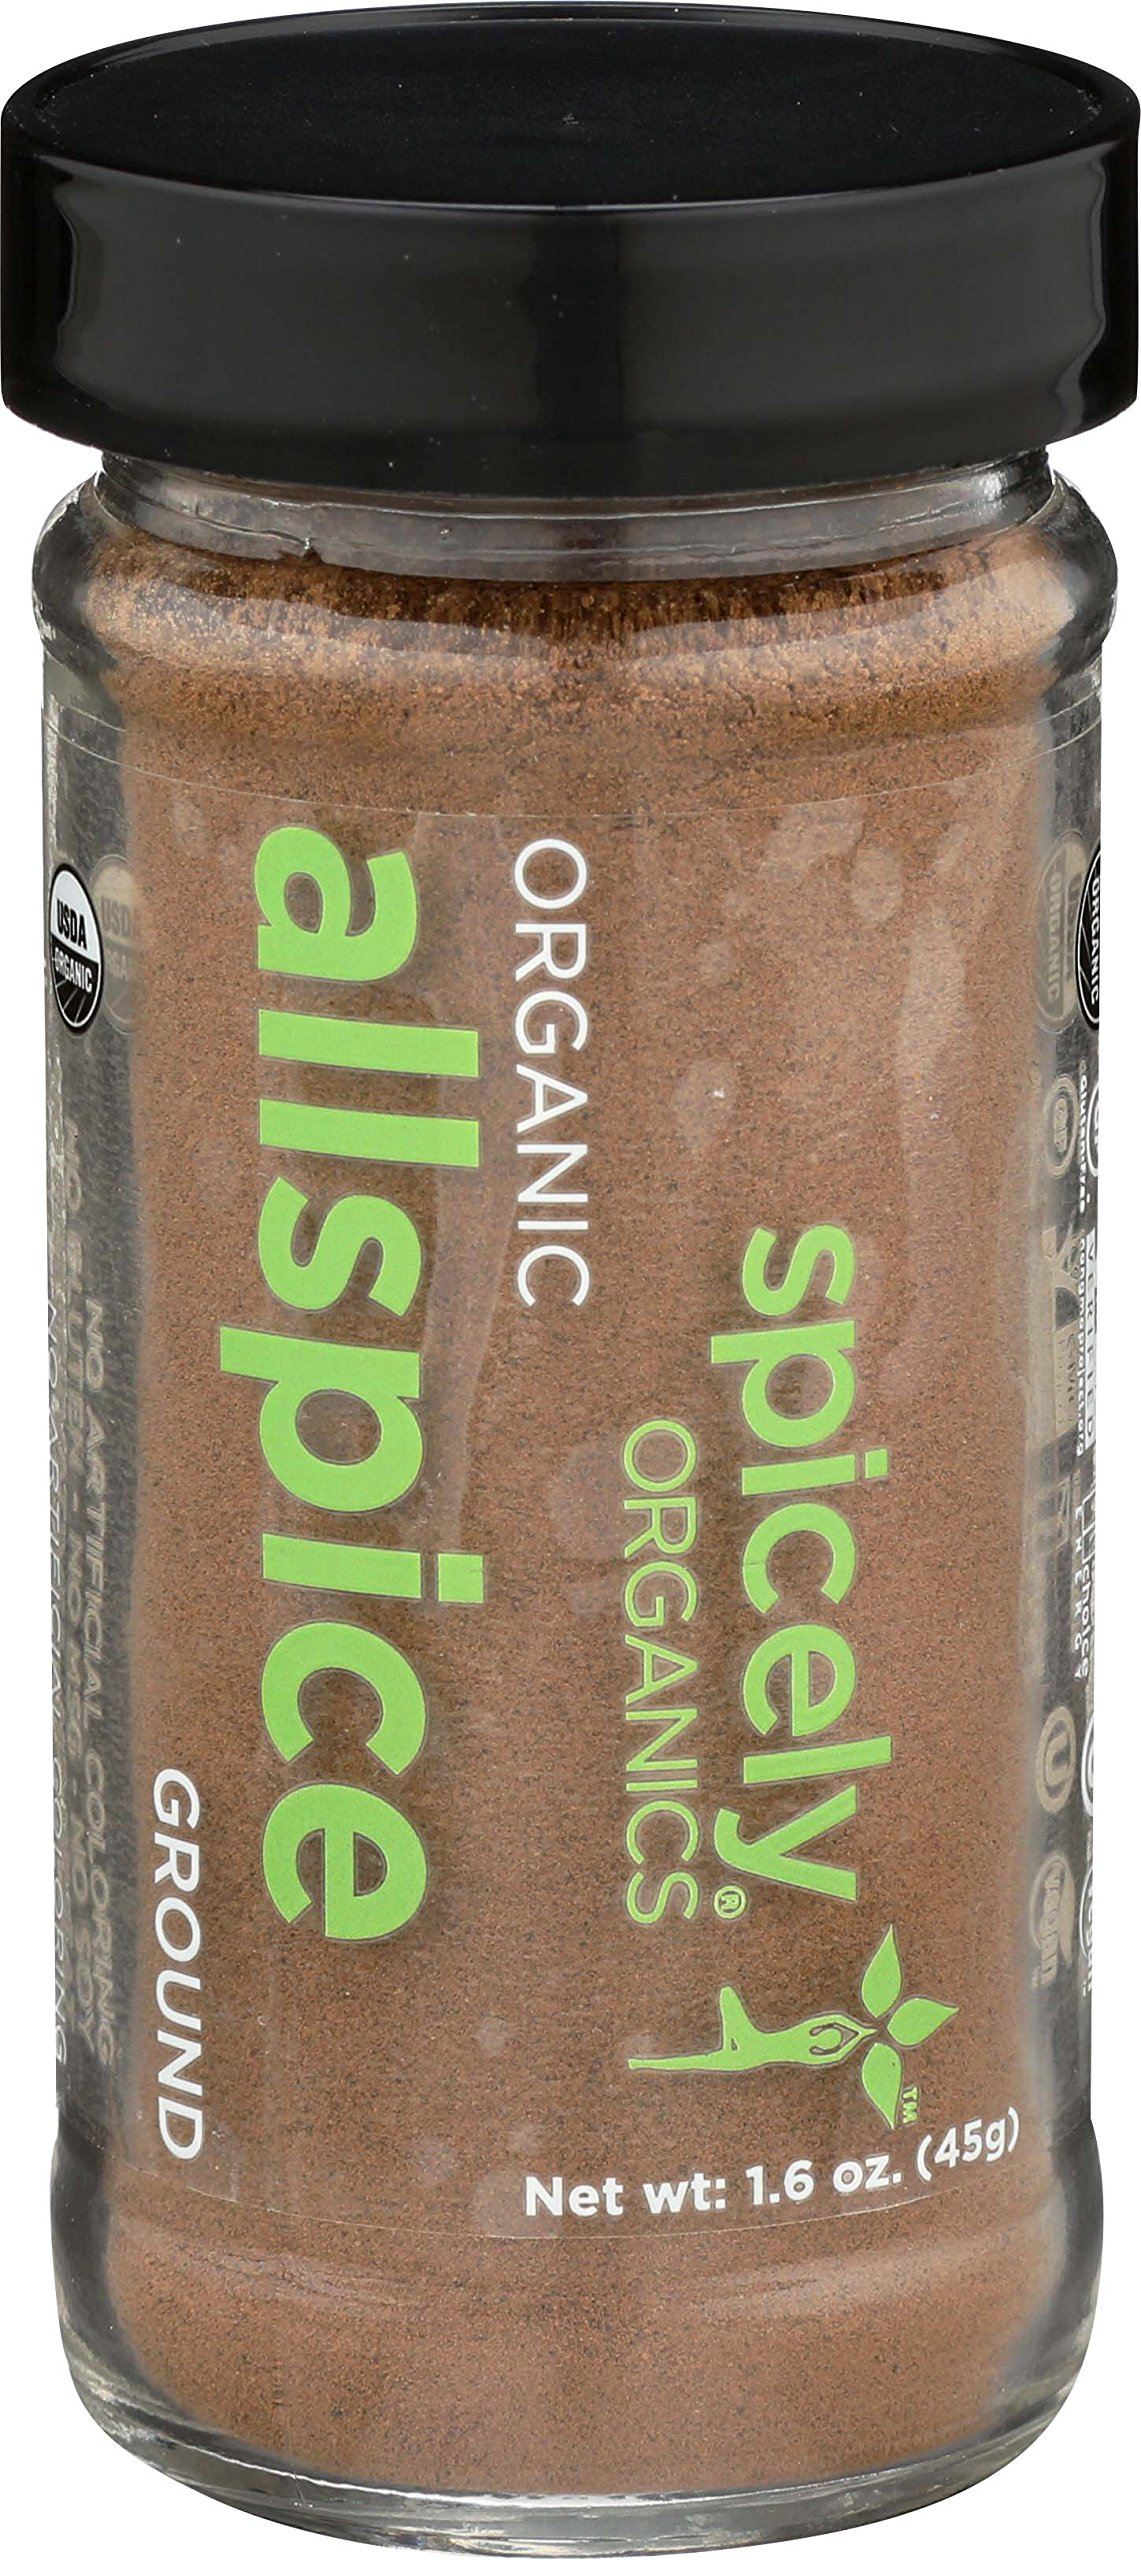 Spicely Organic Allspice Powder 1.60 Ounce Jar Certified Gluten Free